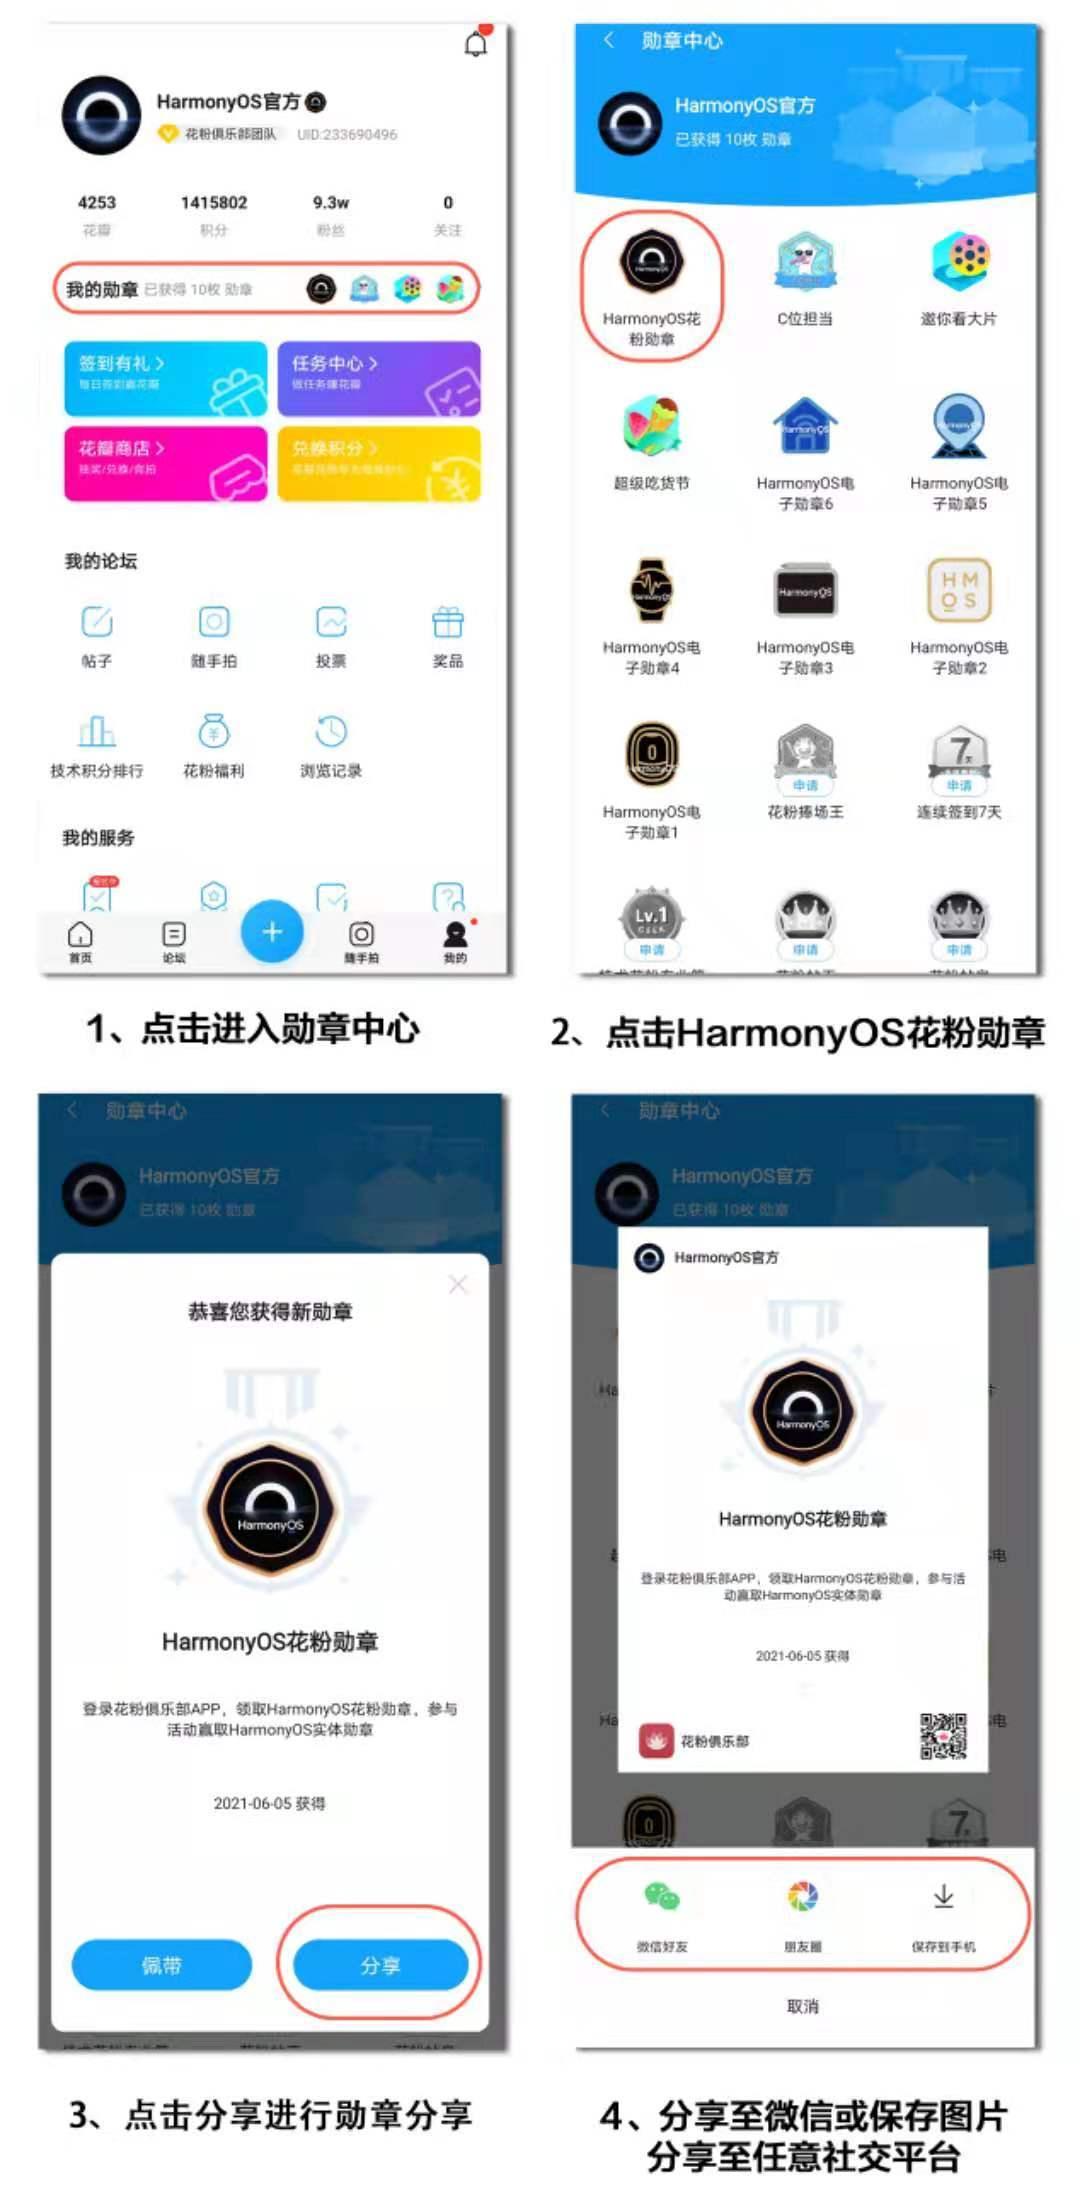 Harmony OS 2活动答题赢实体勋章-鸿蒙HarmonyOS技术社区